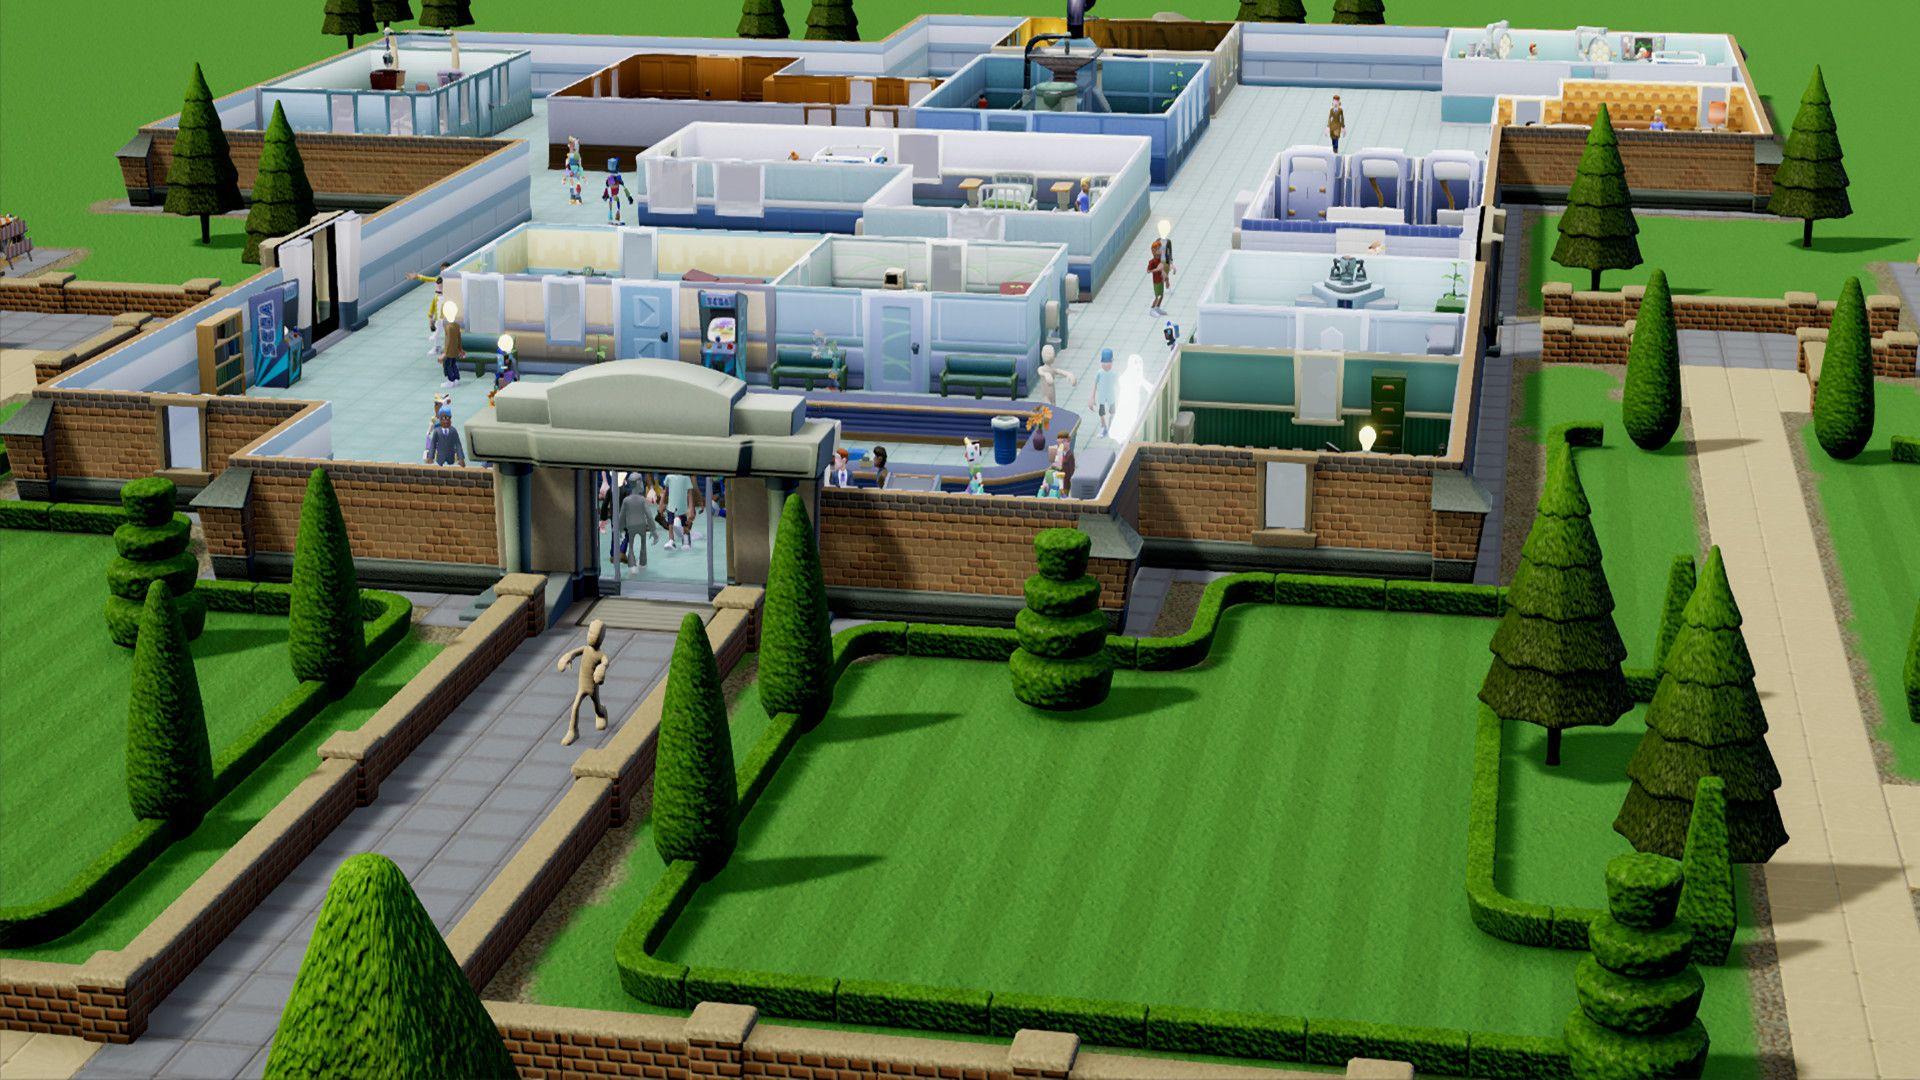 primer gameplay de Two Point Hospital